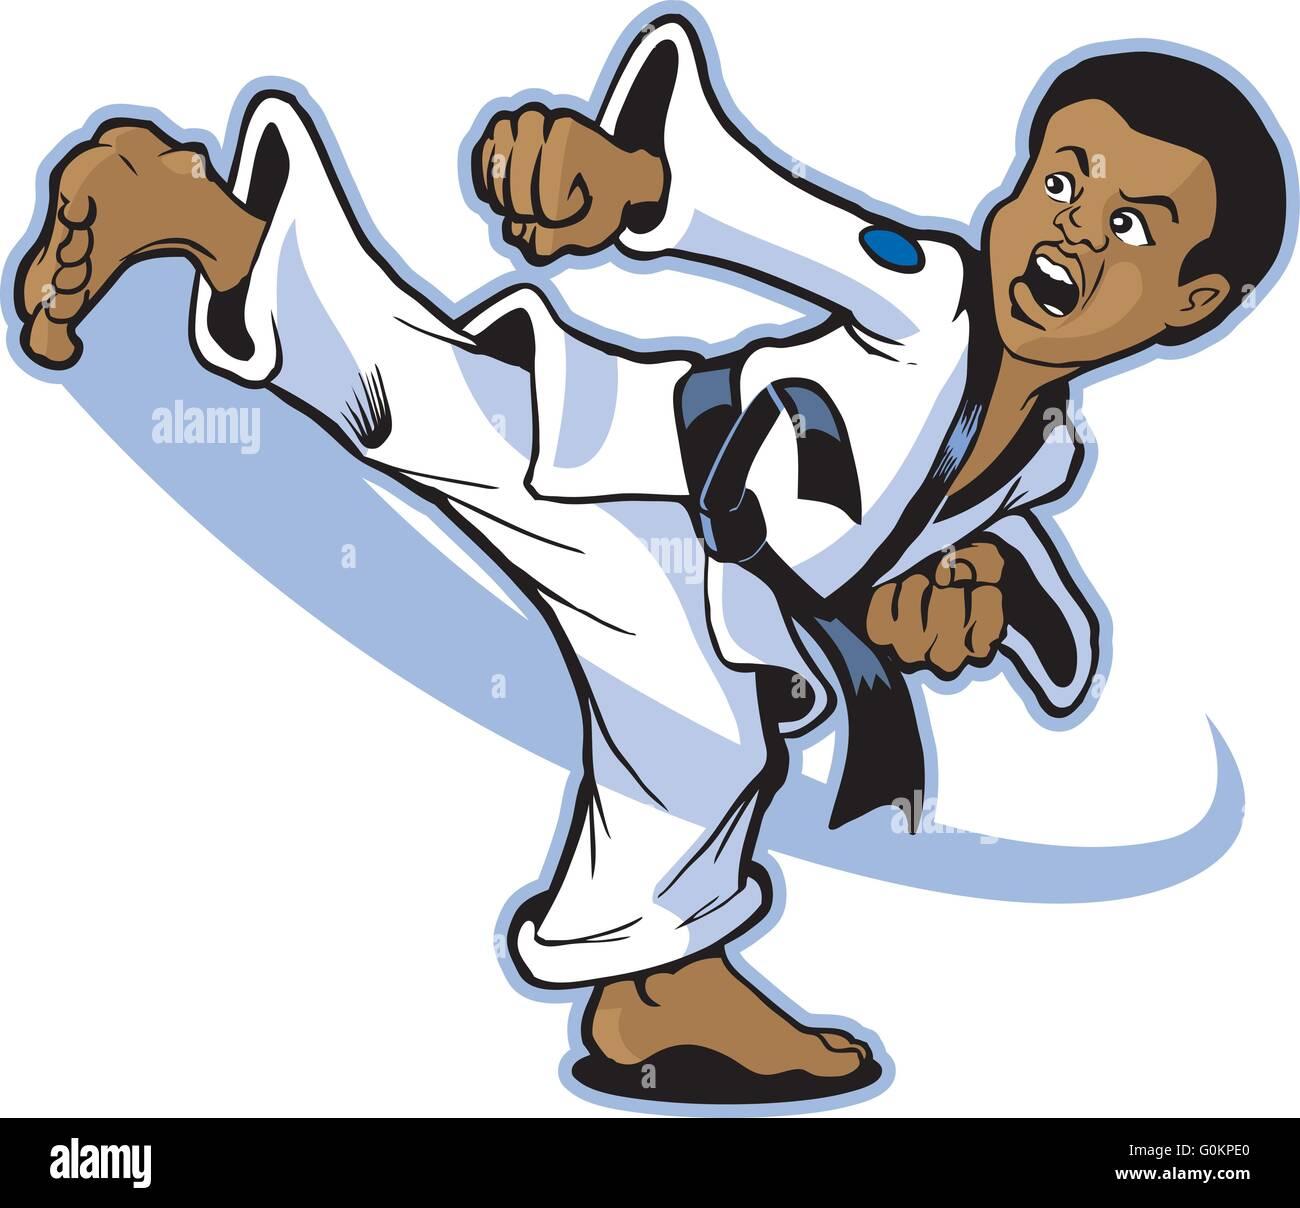 Vector Clip Art Cartoon Illustration Of A Boy Martial Artist Of Stock Vector Image Art Alamy